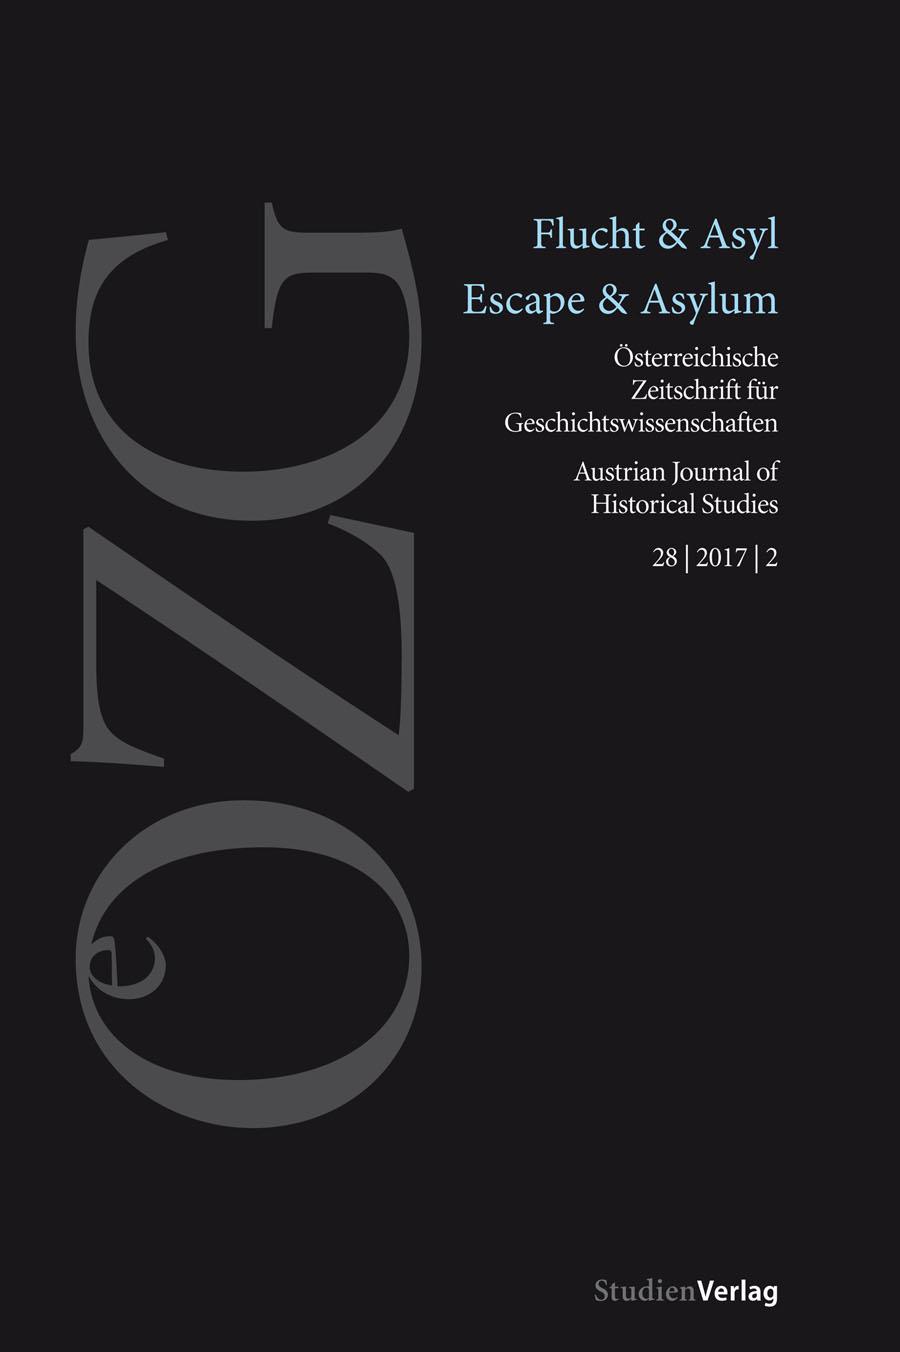 Ansehen Bd. 28 Nr. 2 (2017): Flucht & Asyl / Escape & Asylum